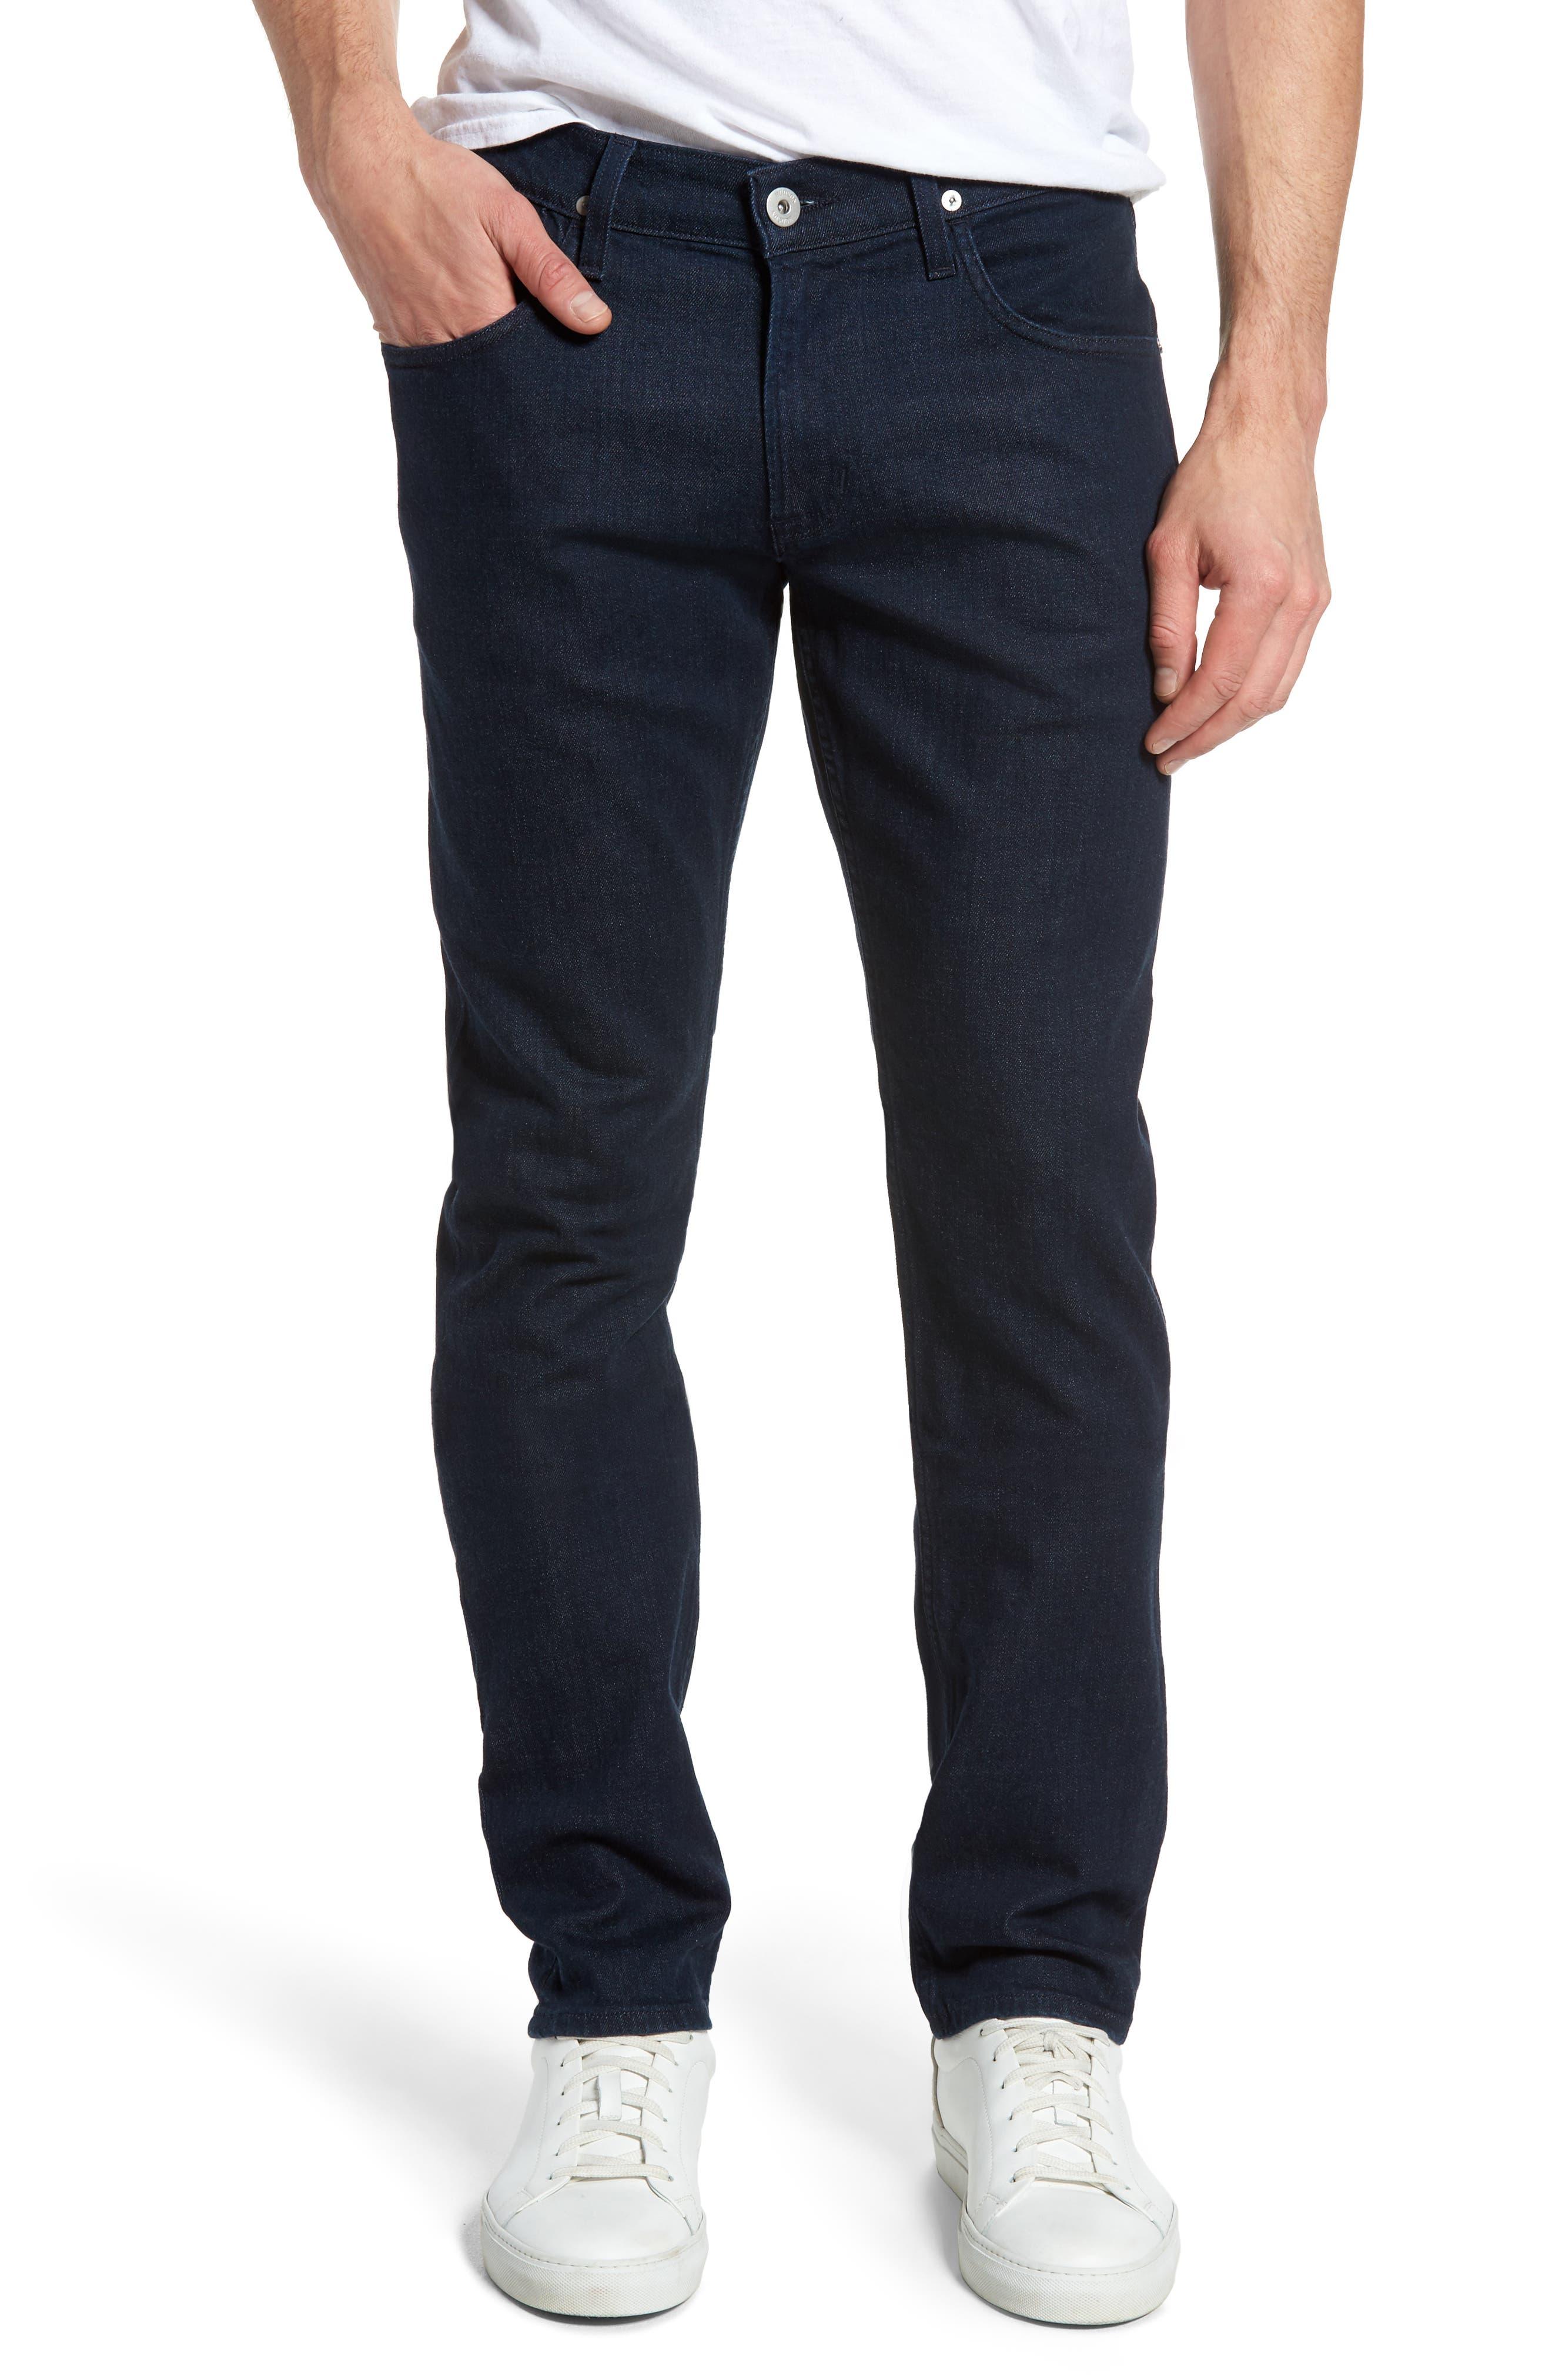 Main Image - Hudson Jeans Blake Slim Fit Jeans (Firebrand)